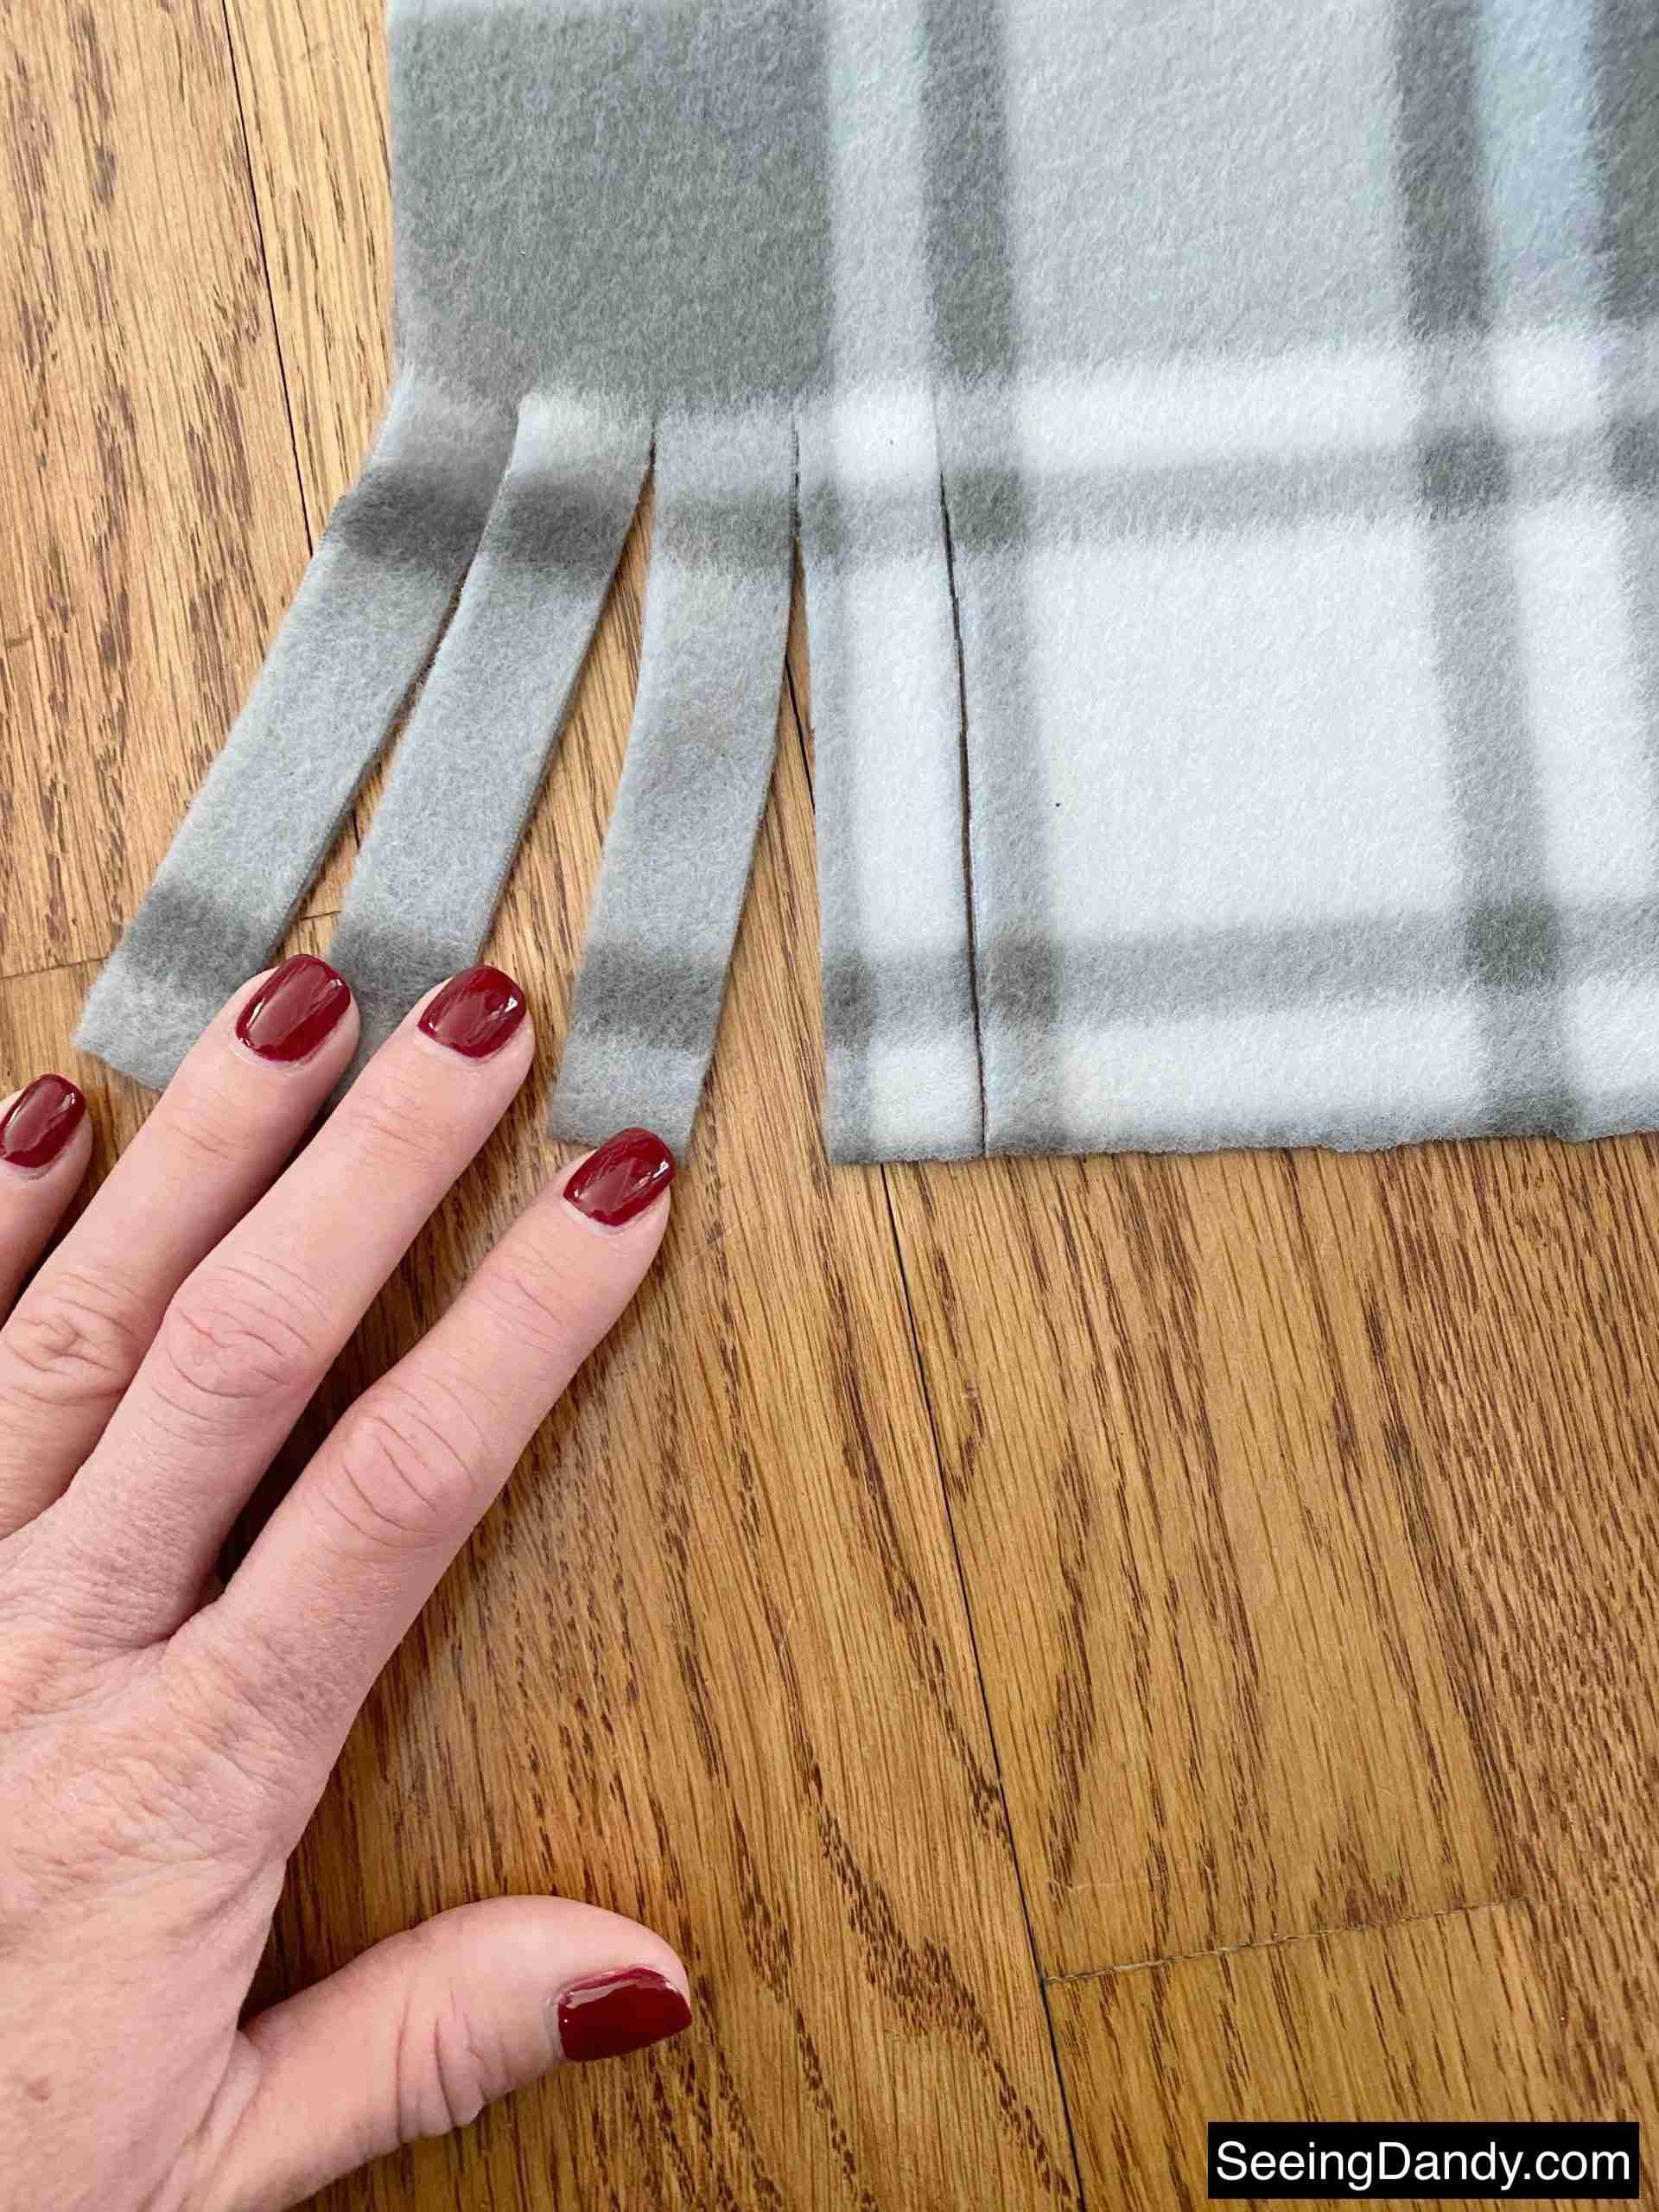 cutting scarf fringe, red purple gel nail polish, hardwood floor, plaid gray white fleece fabric